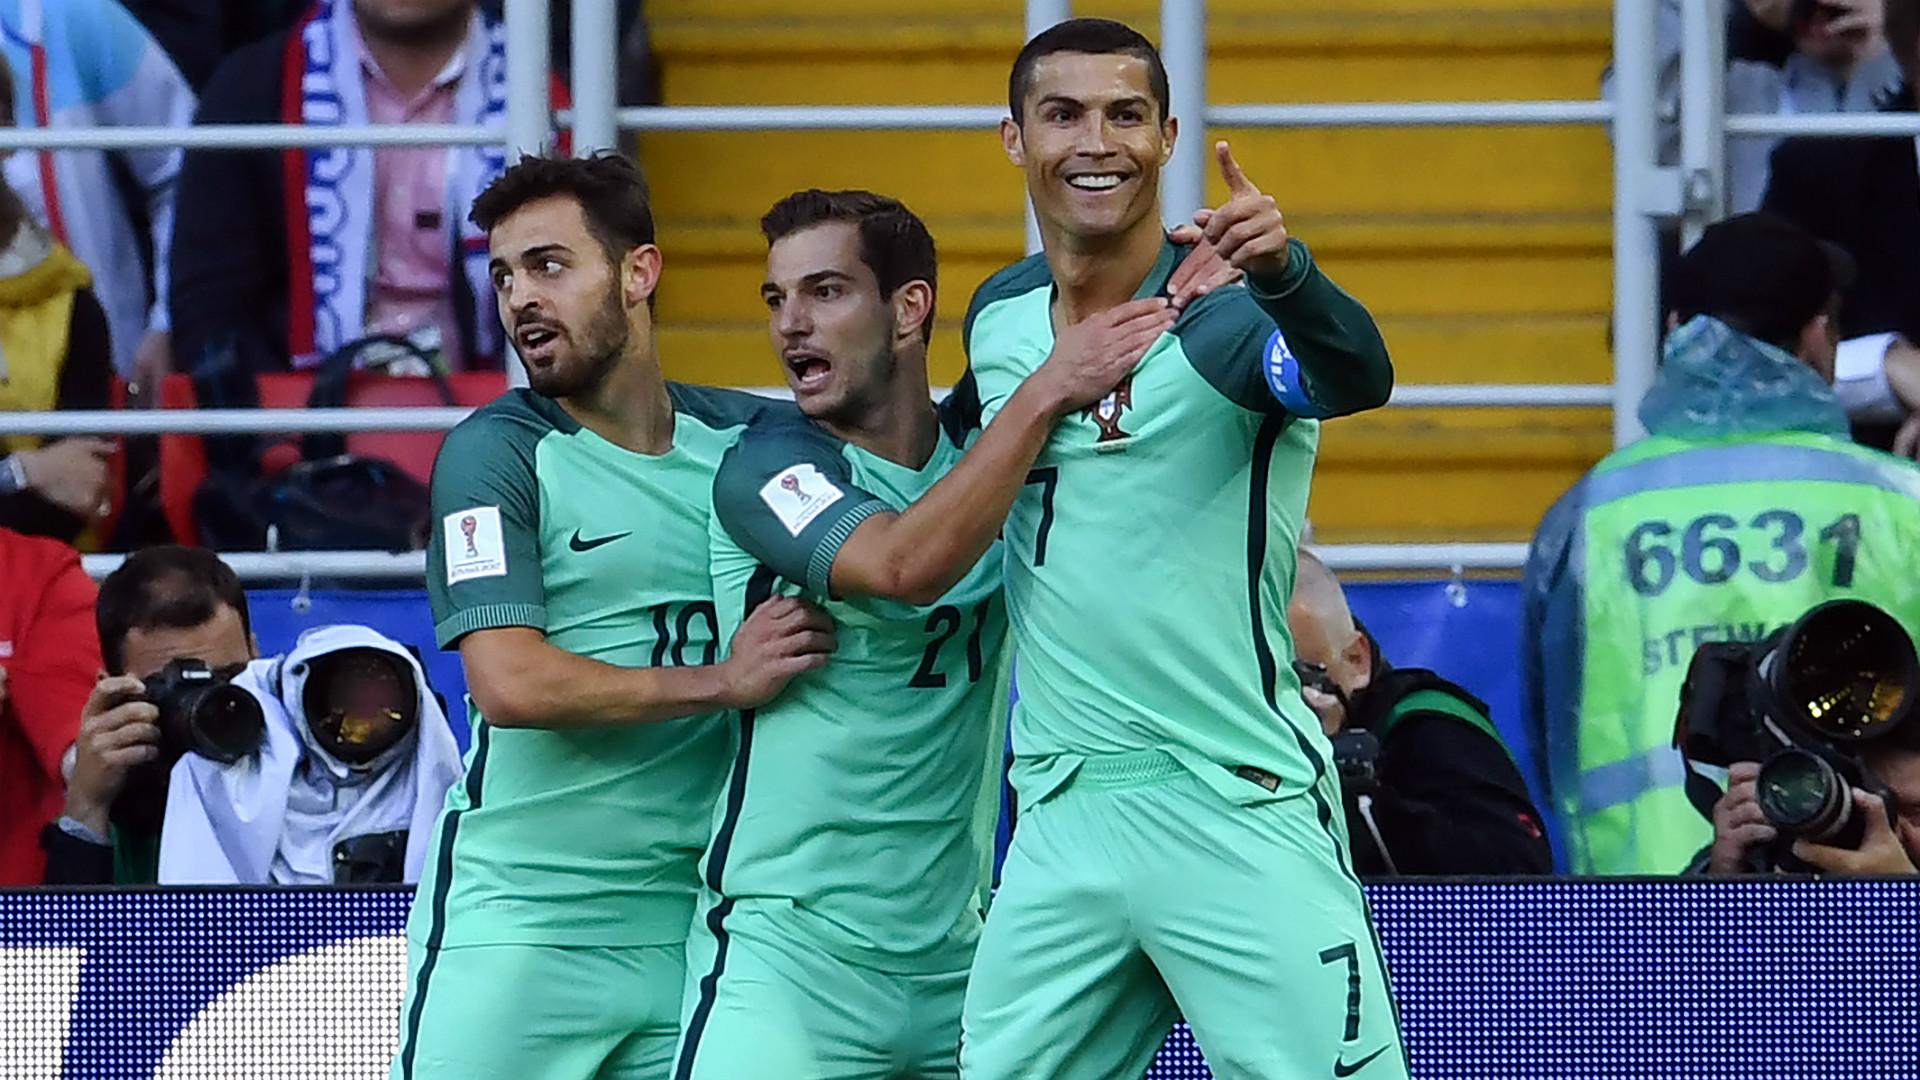 Bernardo Silva Cedric Cristiano Ronaldo Russia Portugal Confederations Cup